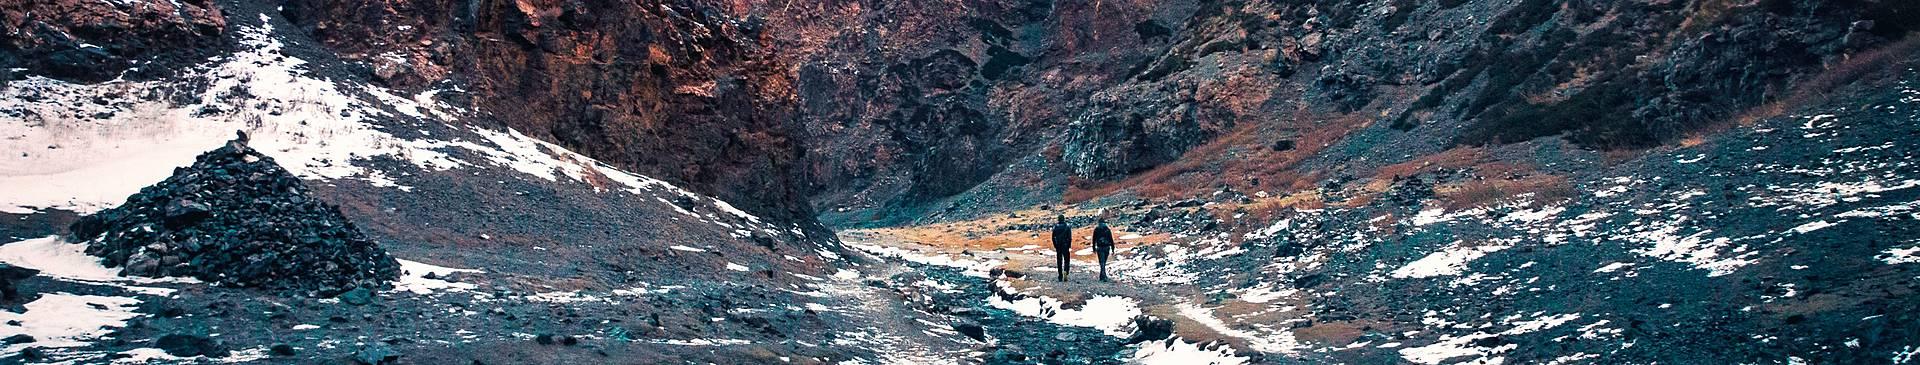 Mongolia off the beaten track